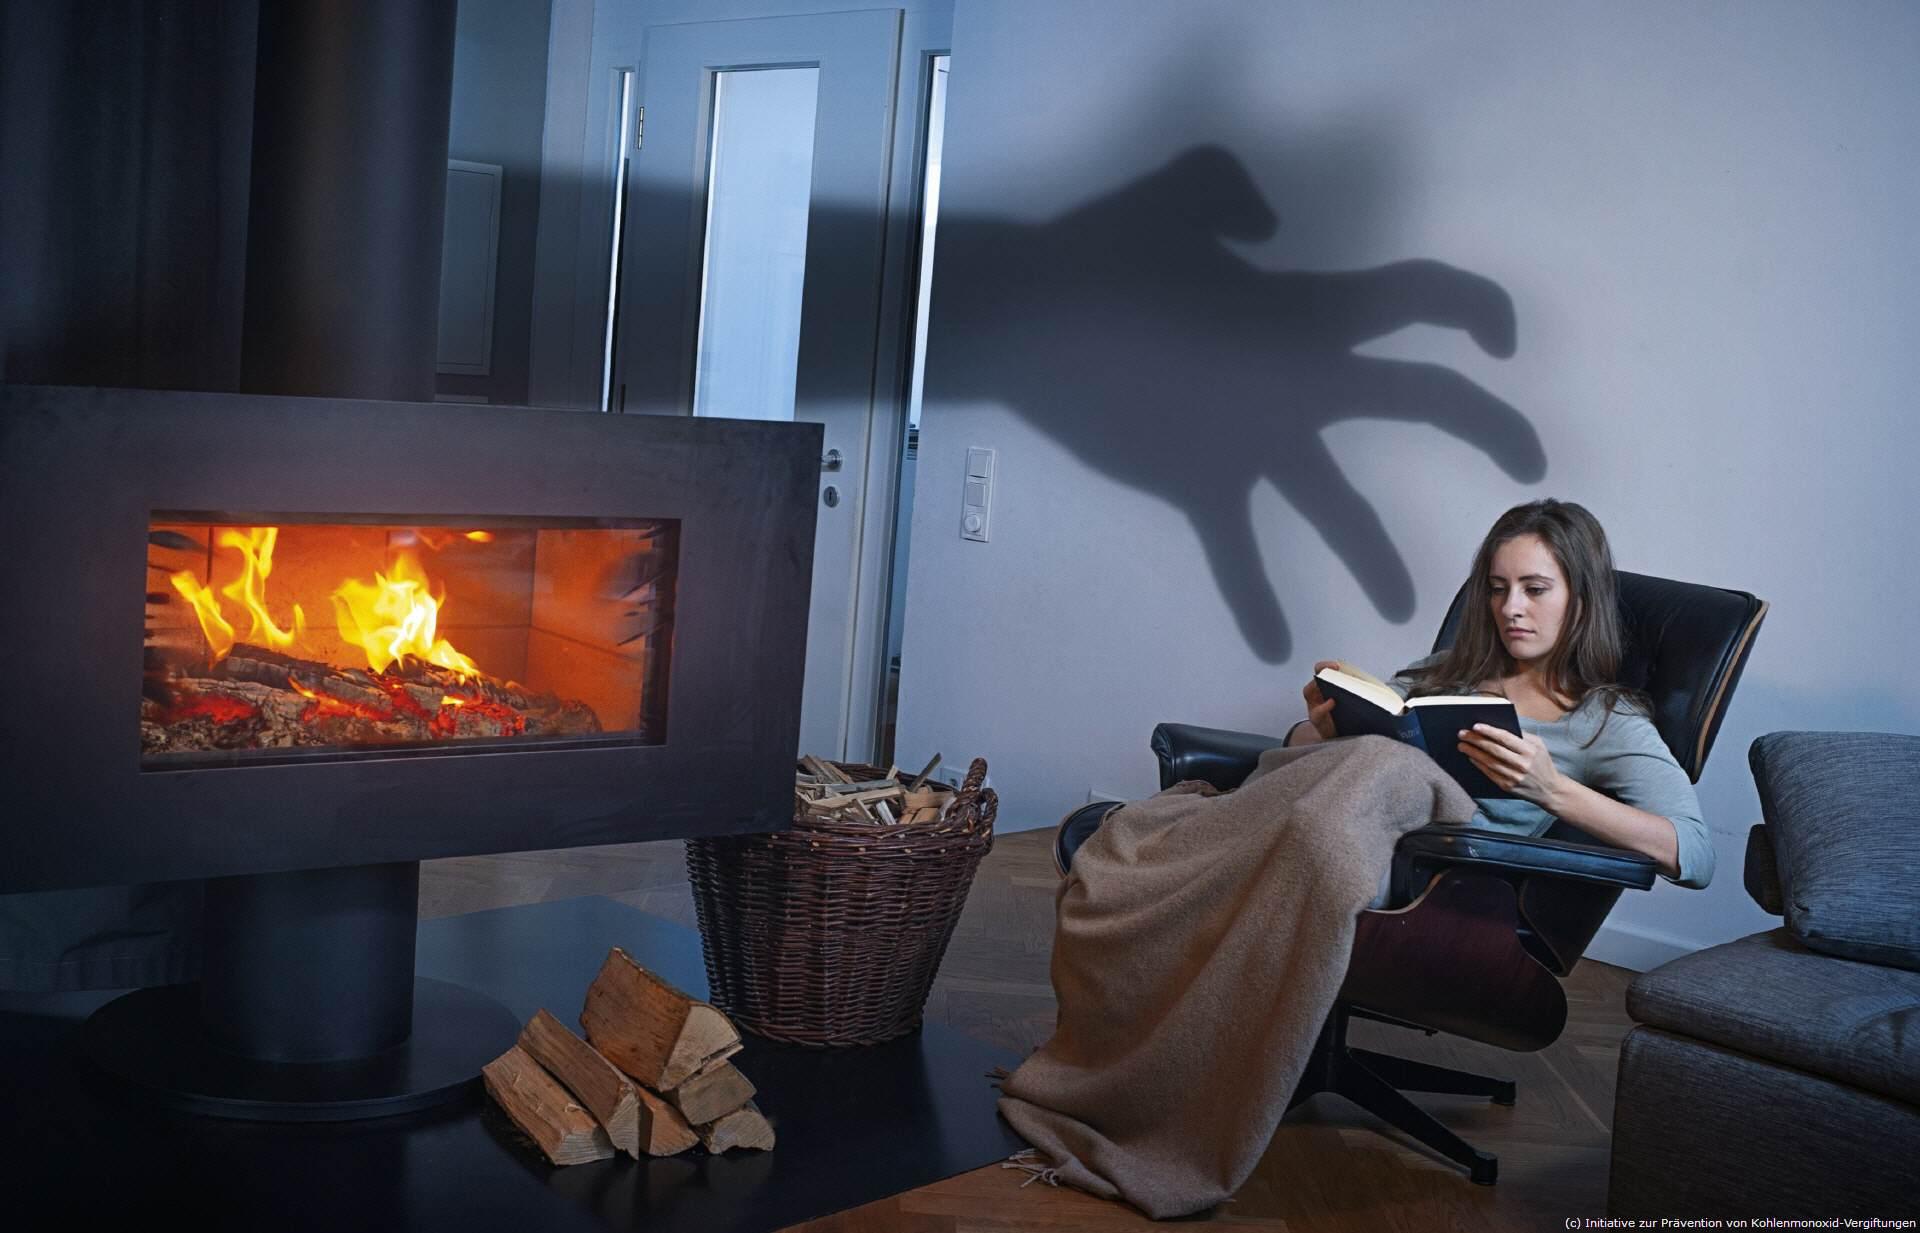 heizen mit holz erneuerbaren energien tipps f r. Black Bedroom Furniture Sets. Home Design Ideas